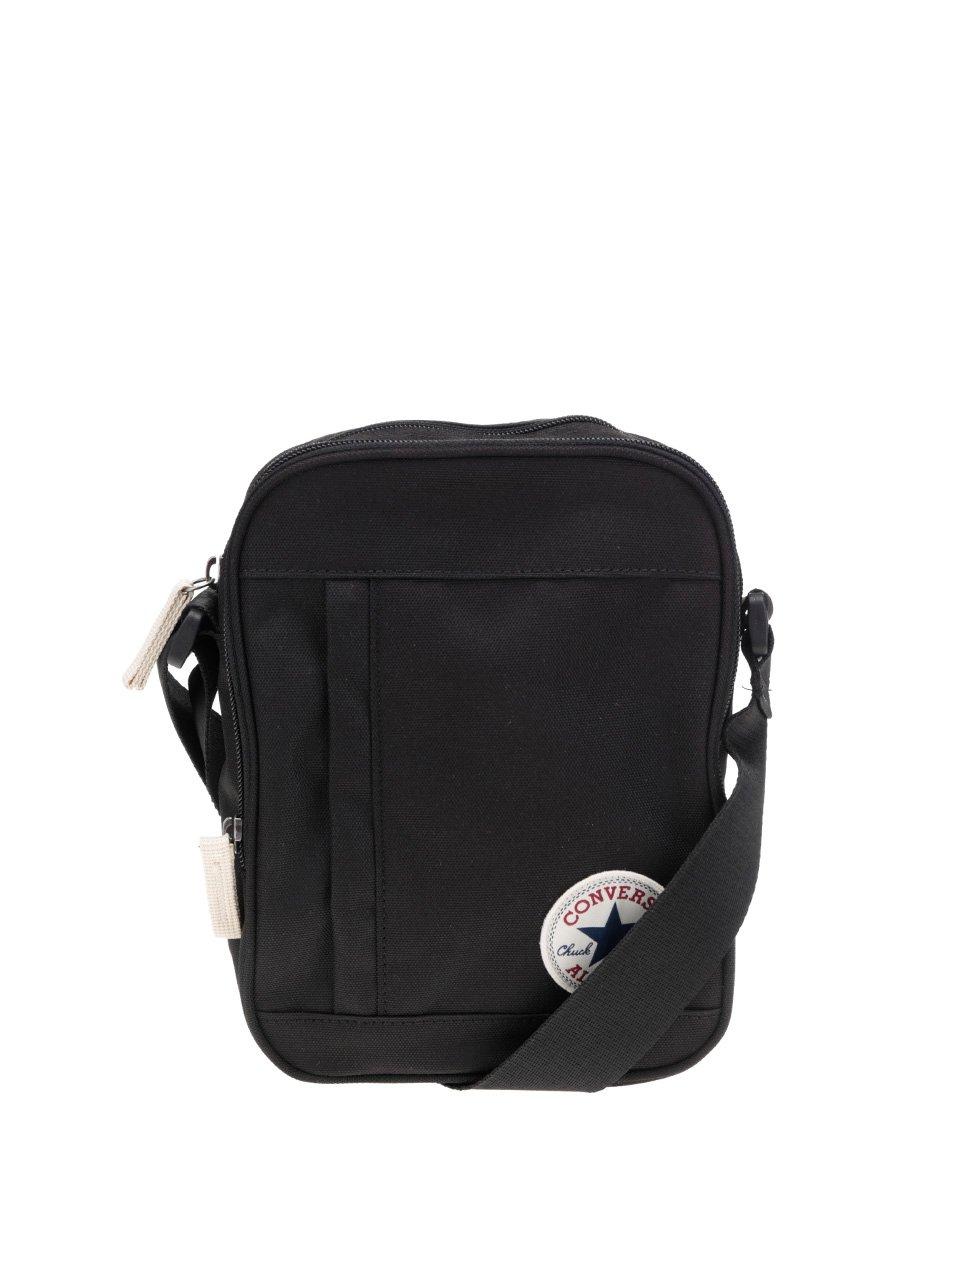 Černá crossbody taška s logem Converse